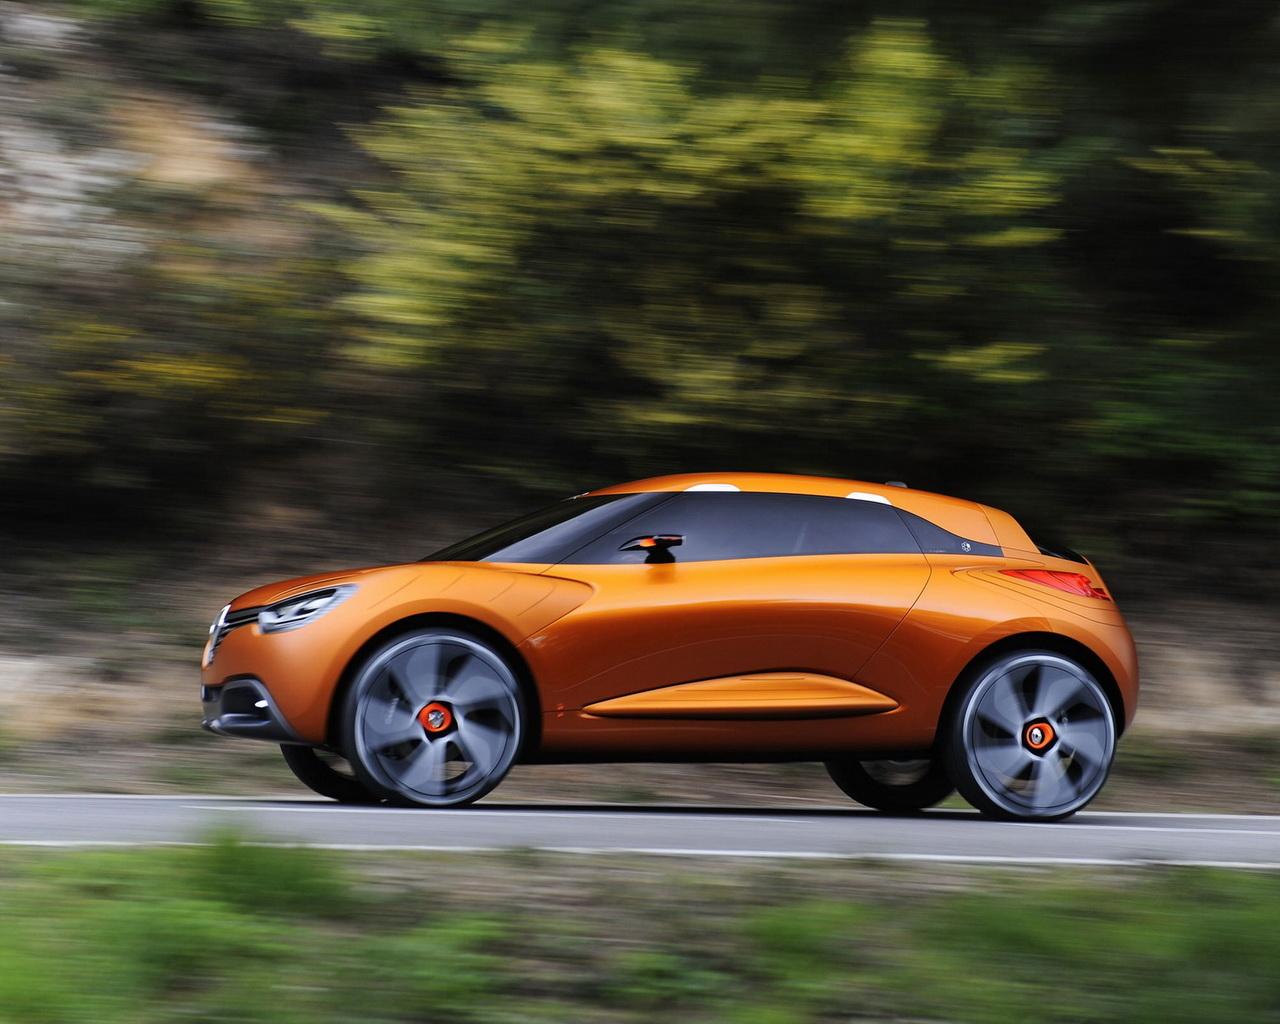 http://www.zastavki.com/pictures/1280x1024/2011/Auto_Prototypes___Concept_cars_Renault_Capture_Concept_029120_.jpg